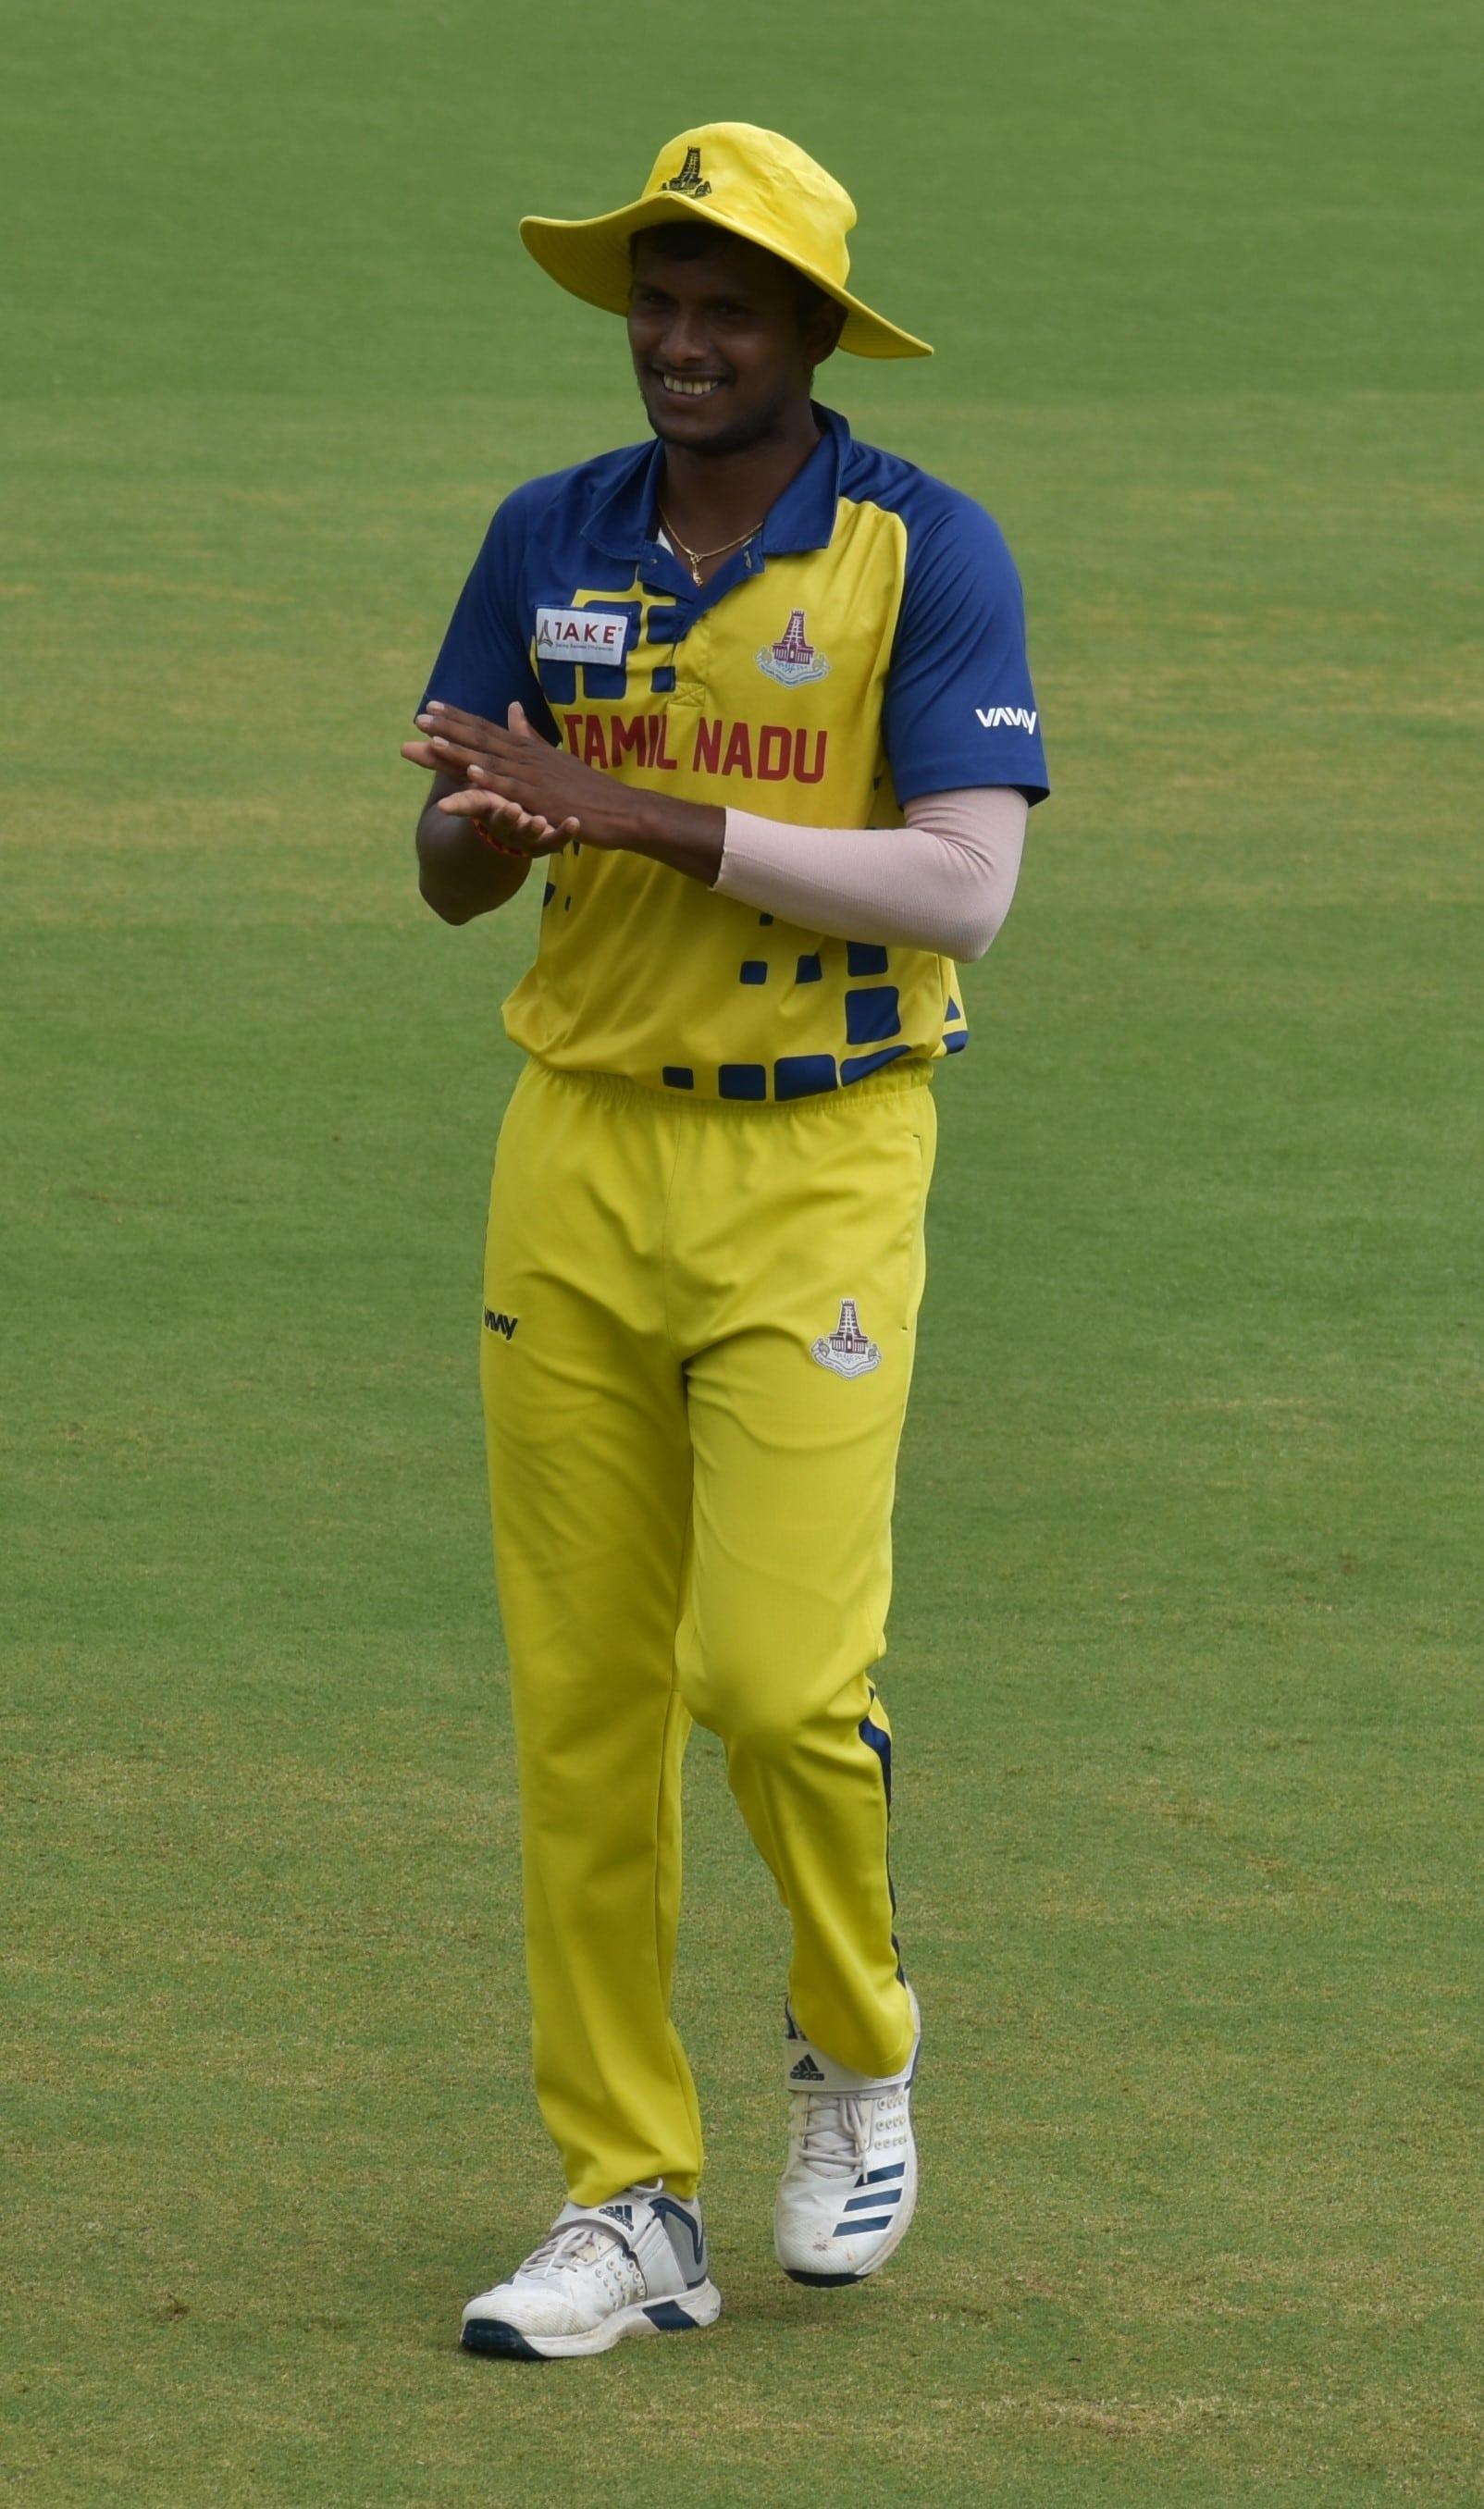 Thangarasu Natarajan Indian Cricketer